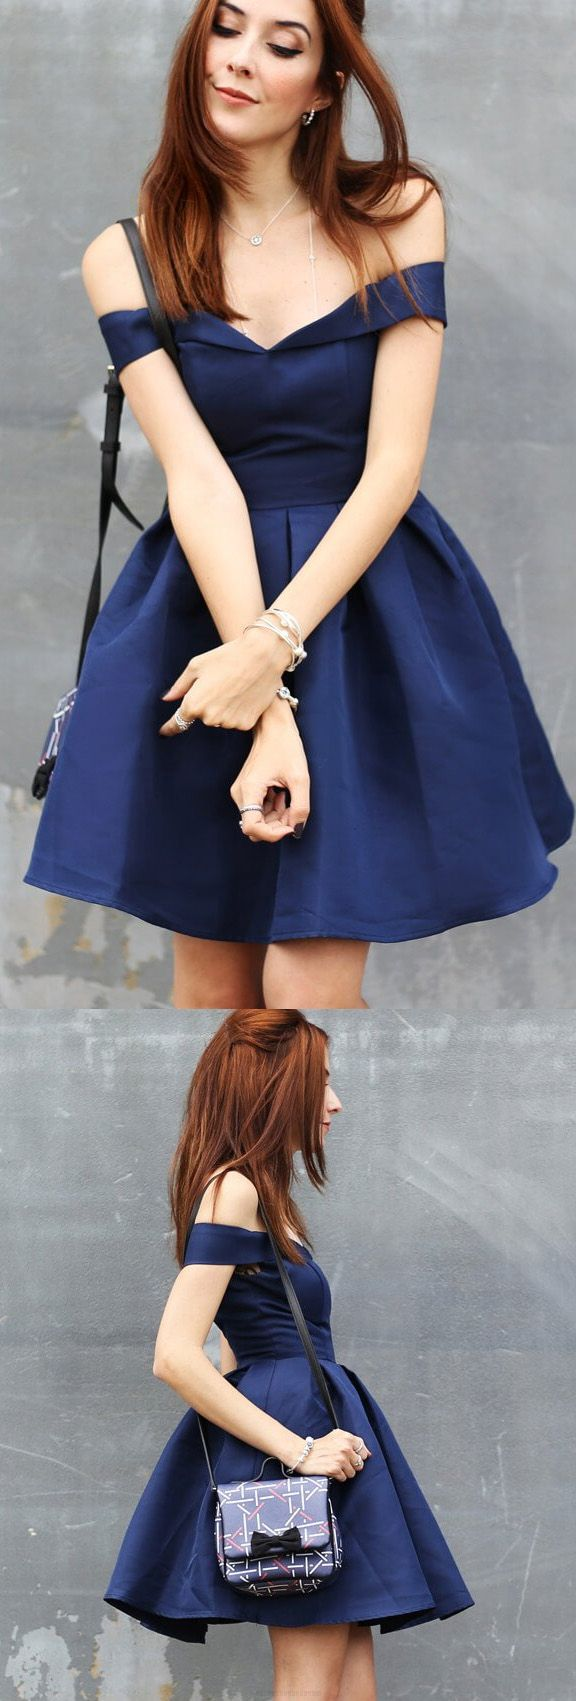 best dress for diva images on pinterest princess prom